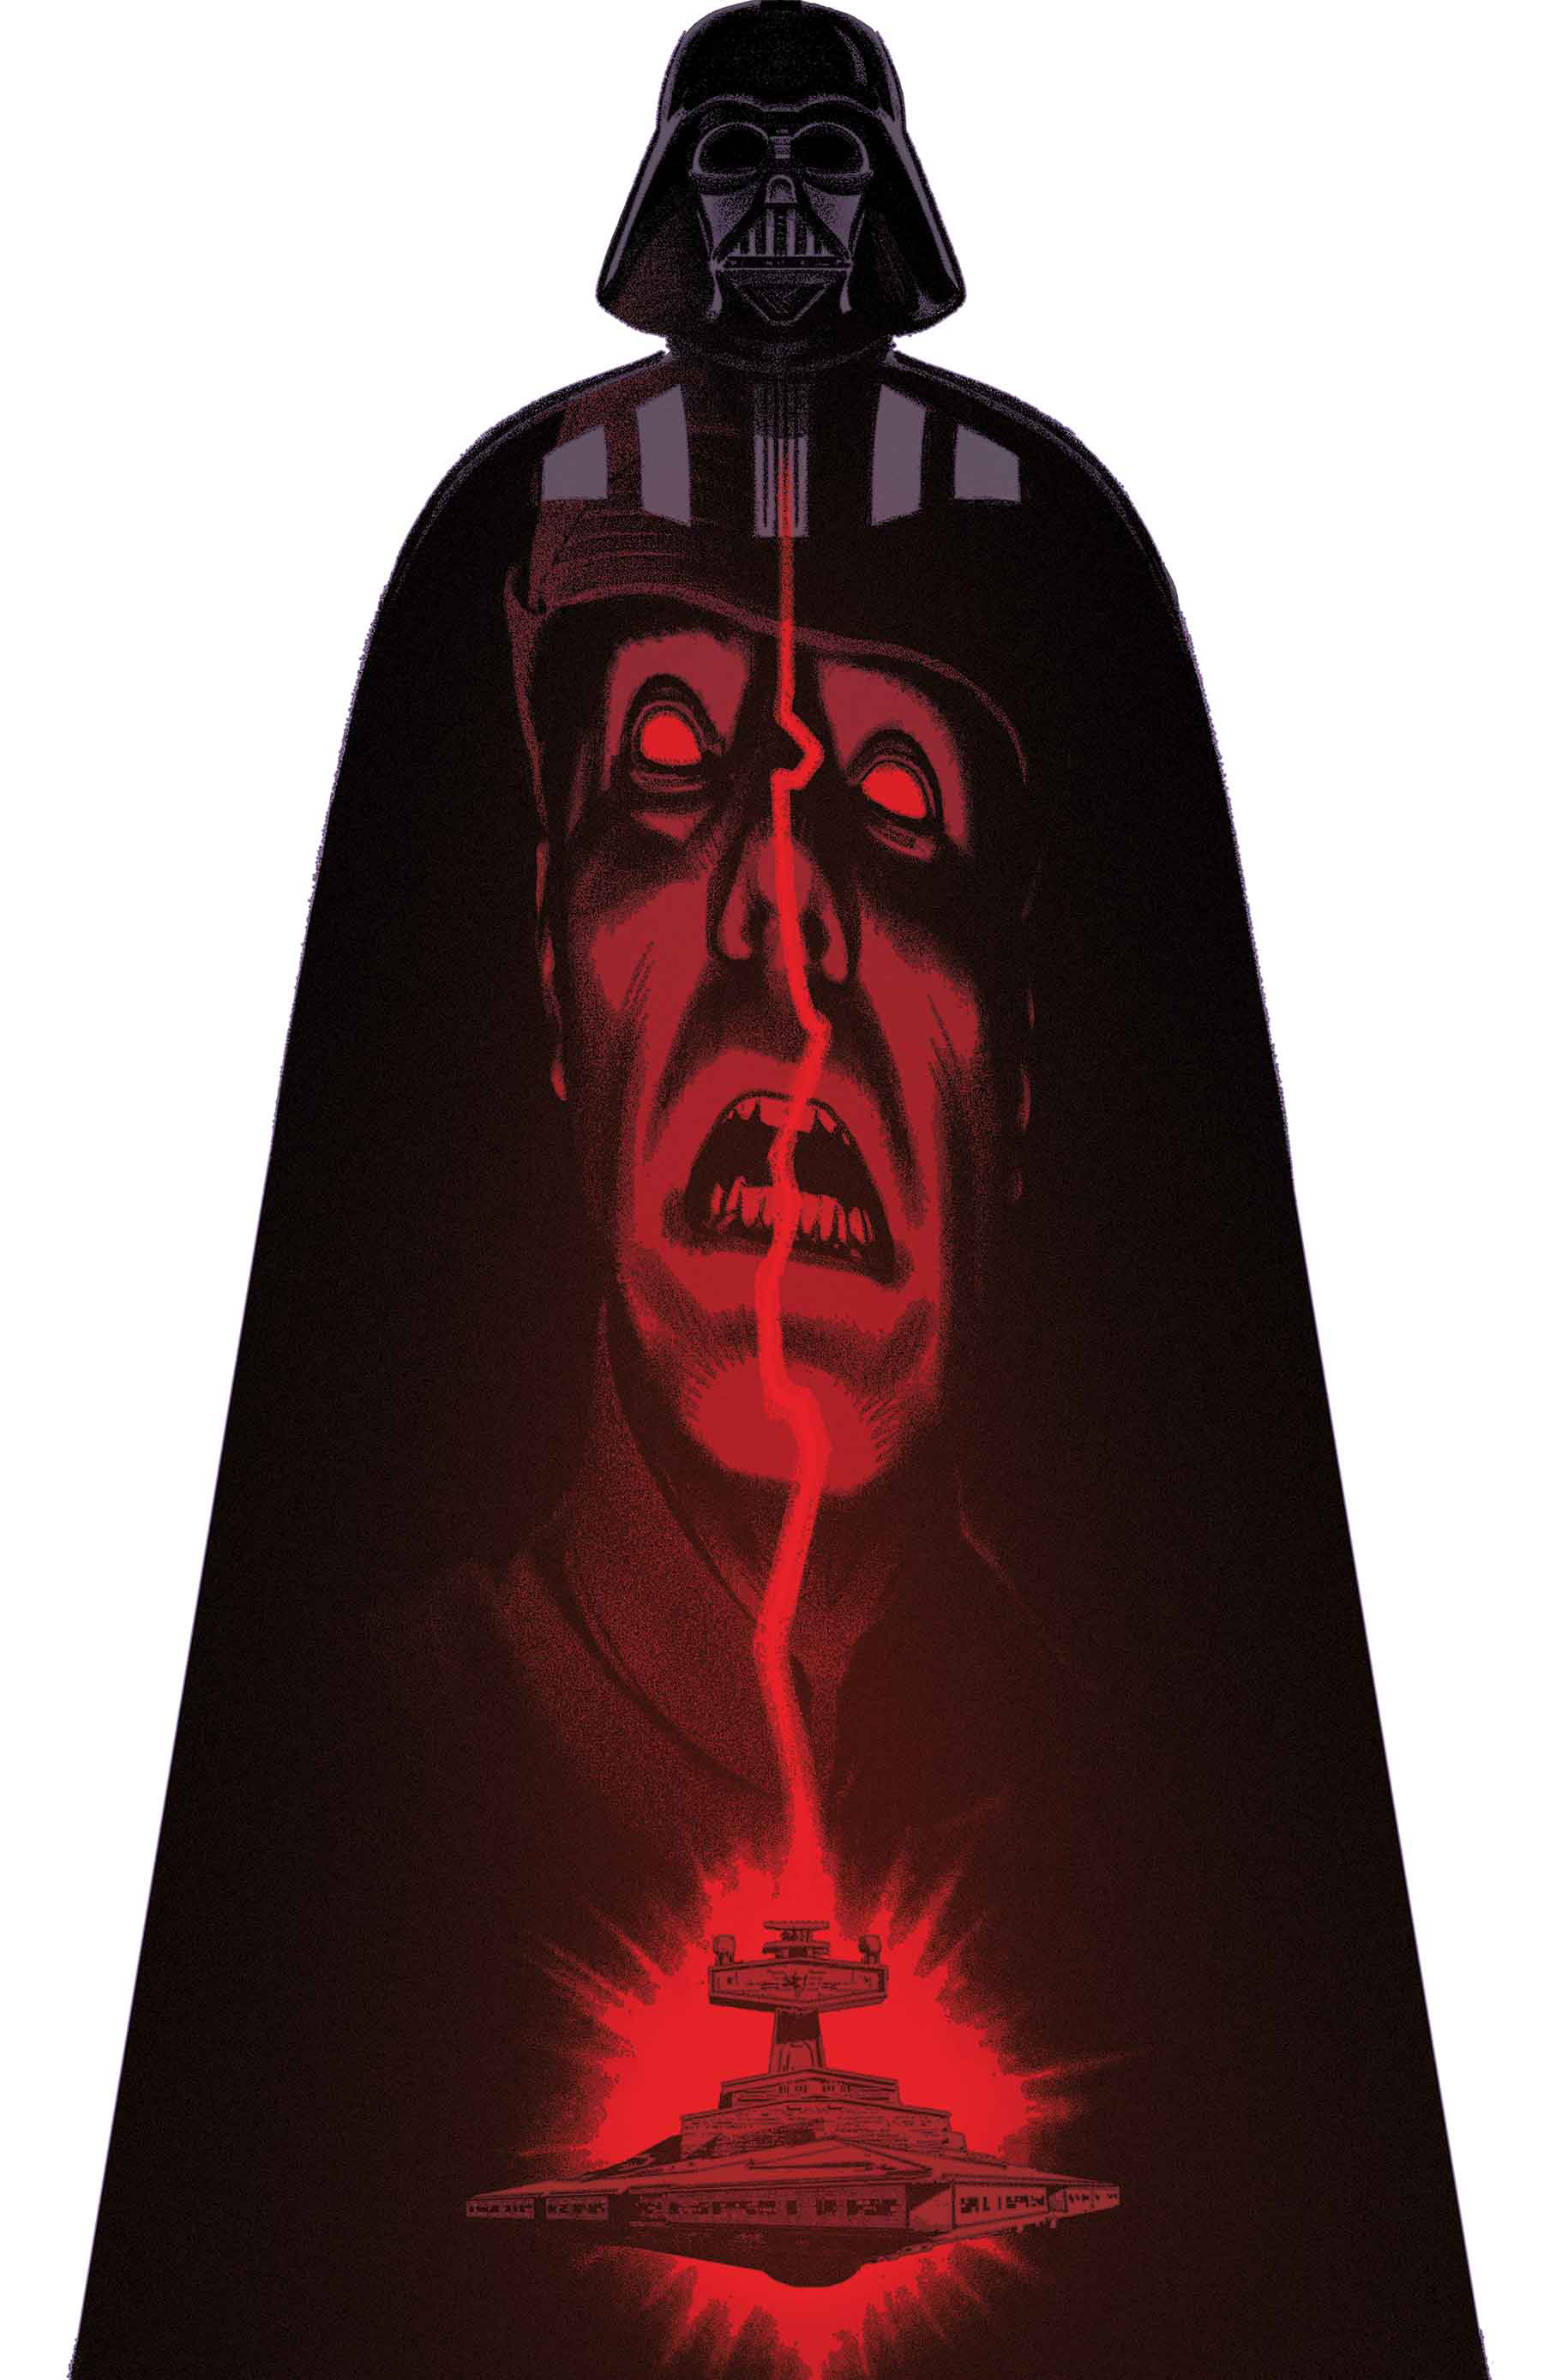 star wars - Vador - Sombres visions 2 - Vader - Dark Visions 2